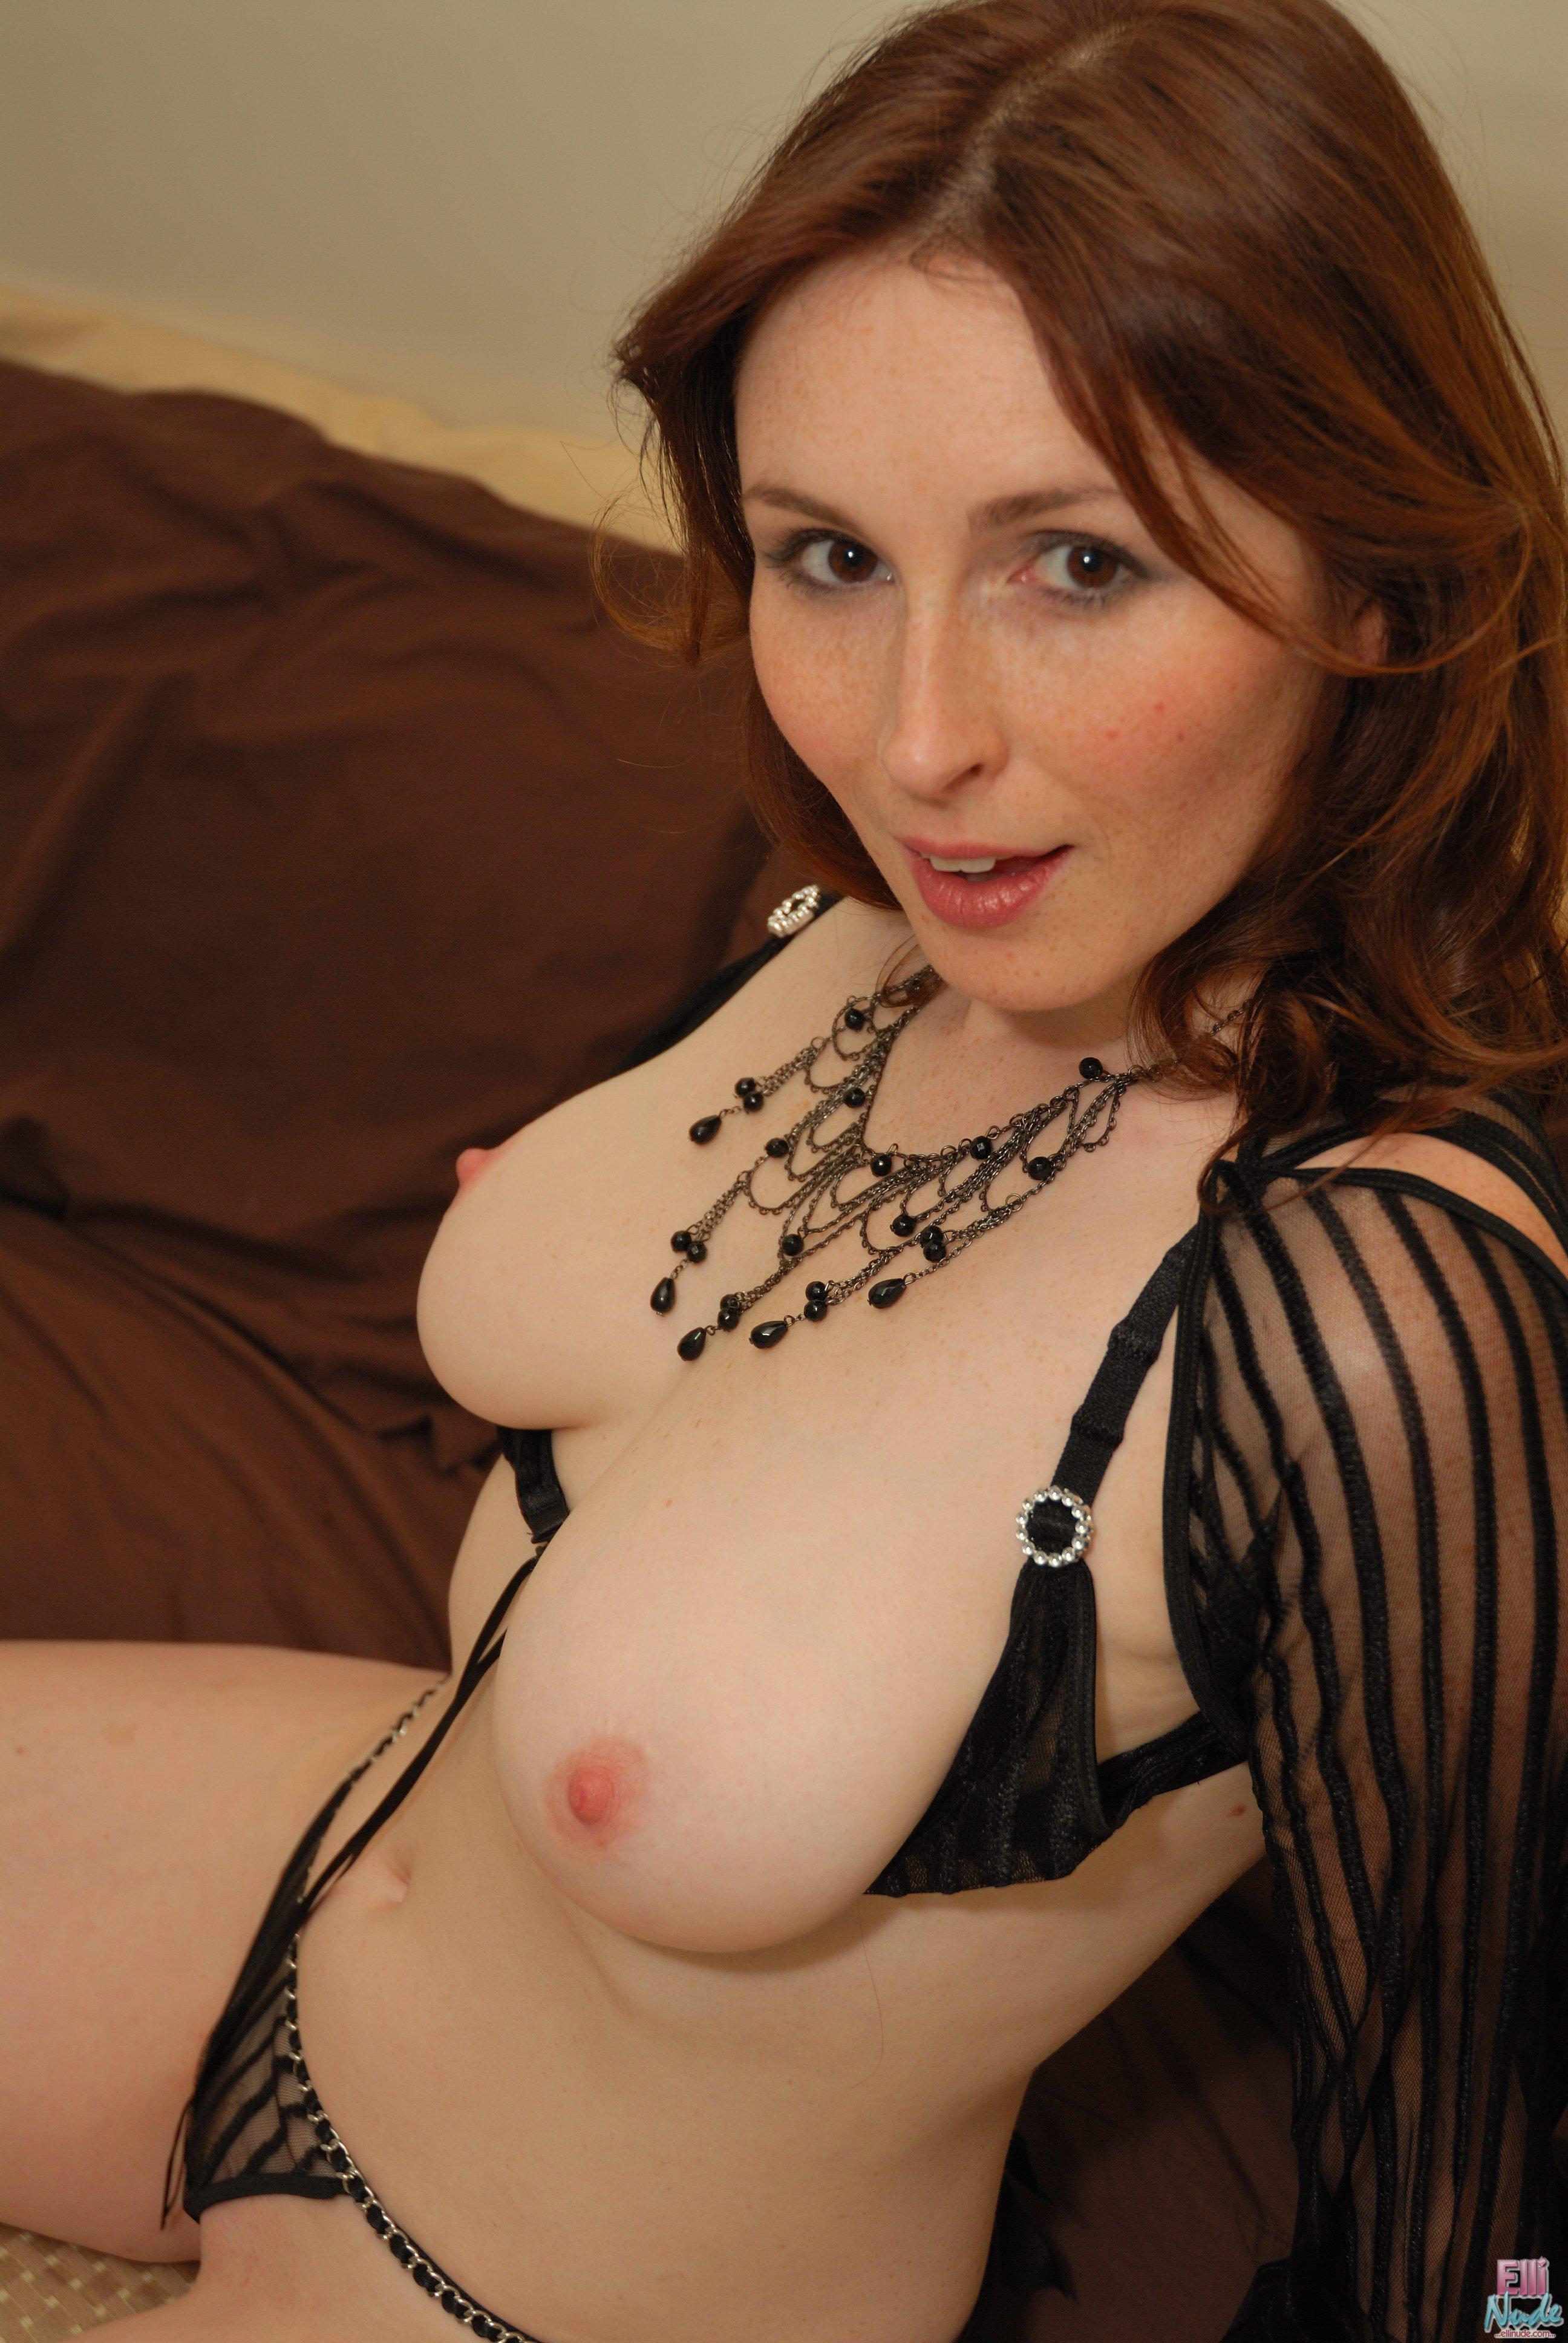 toni gonzaga nude photos hot leaked naked pics of toni Nice Tits! Busty Petite Nicetits NiceRack Titsout Tits ImPussy